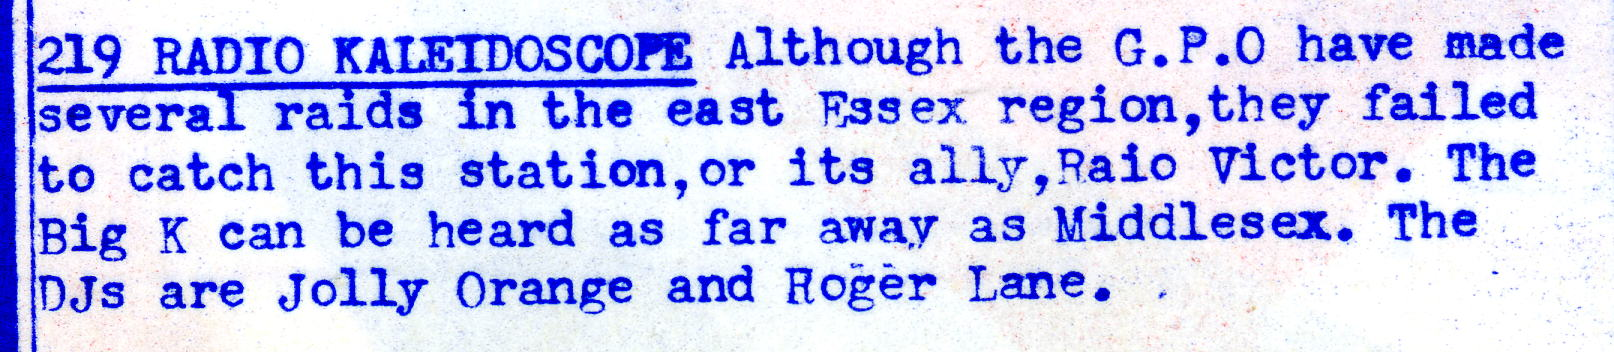 FRC News Jan 1969 - Snip